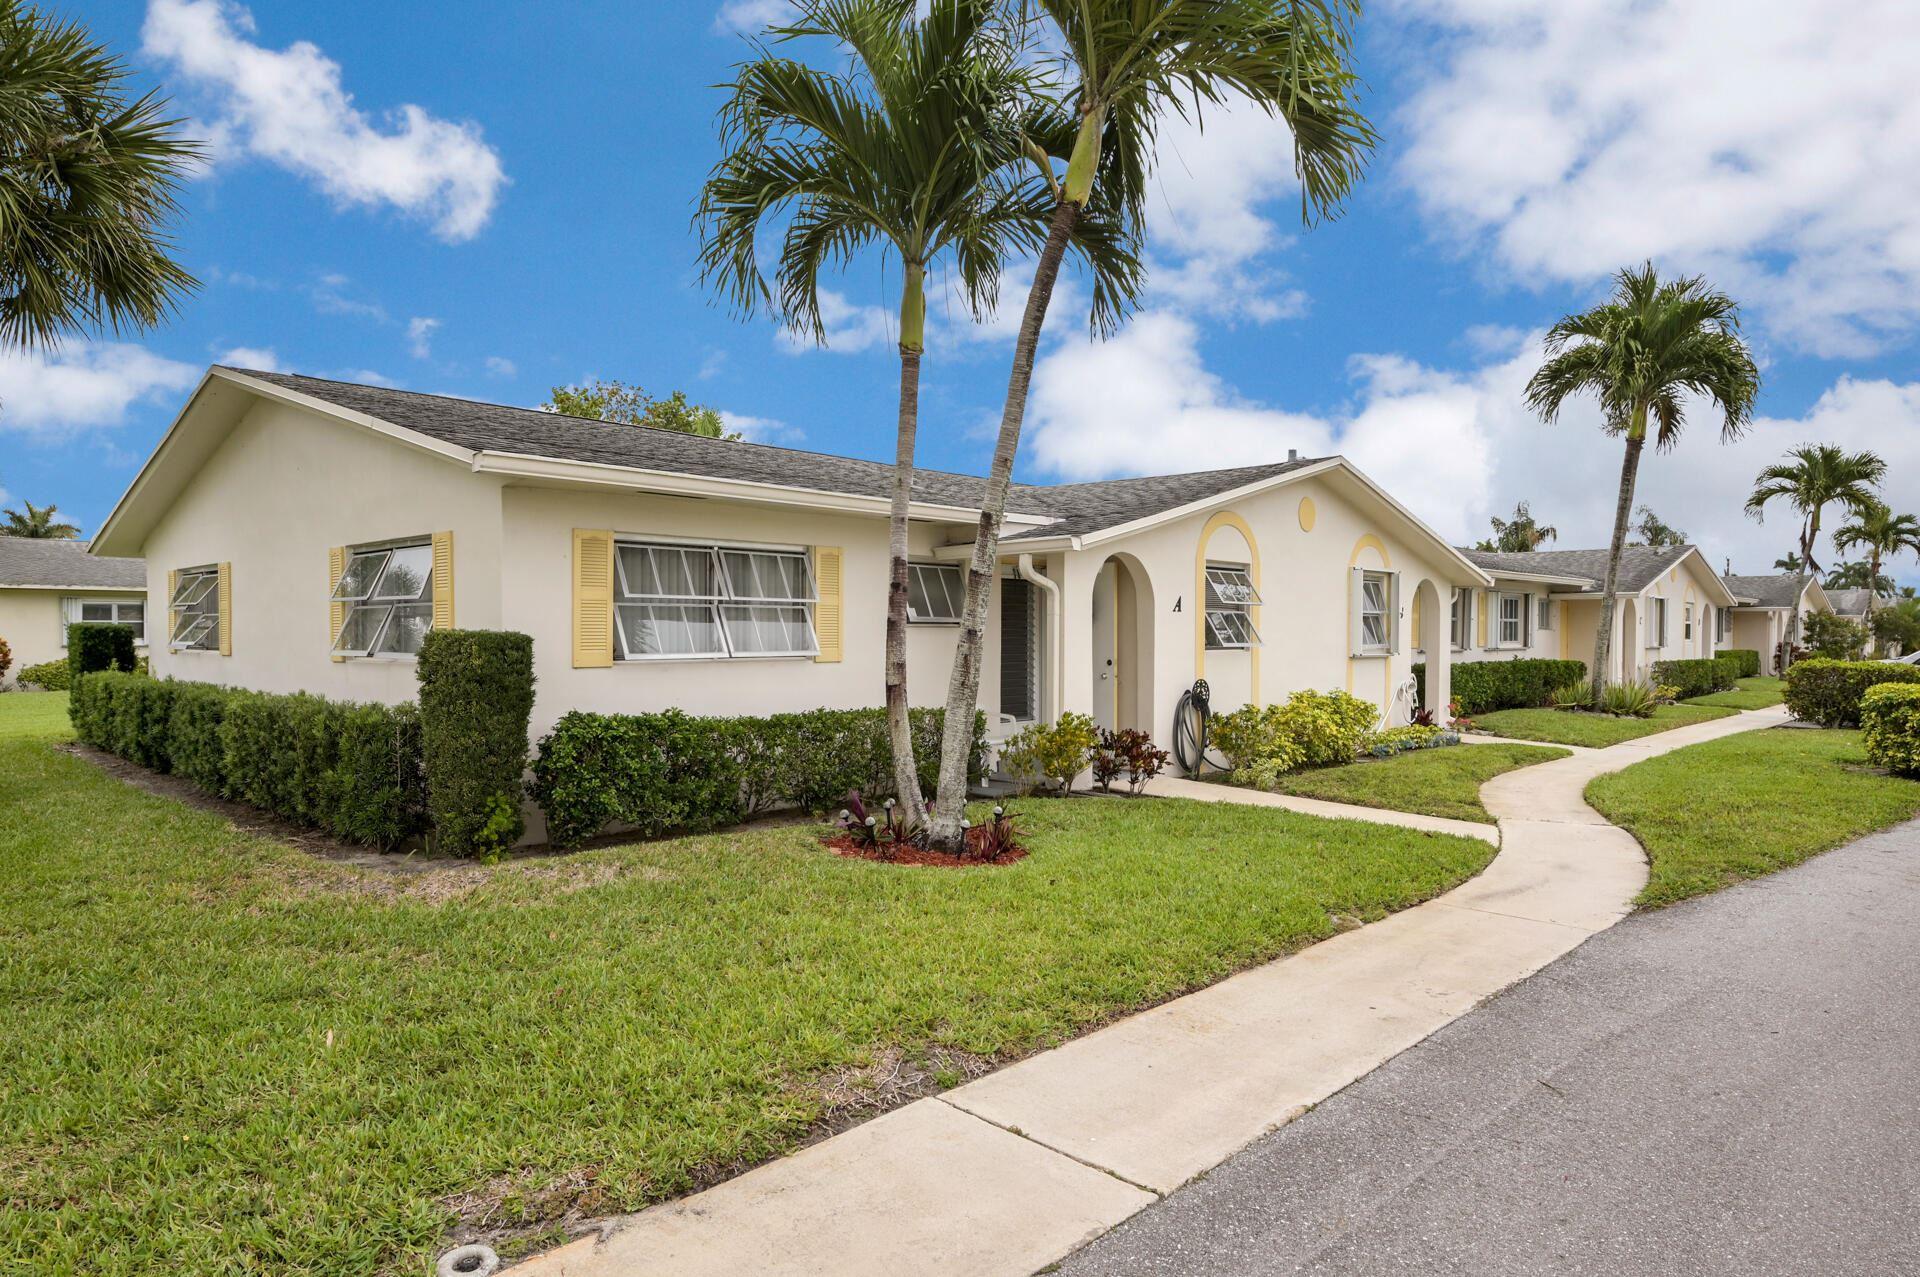 2616 Emory A Drive E #A, West Palm Beach, FL 33415 - MLS#: RX-10710413